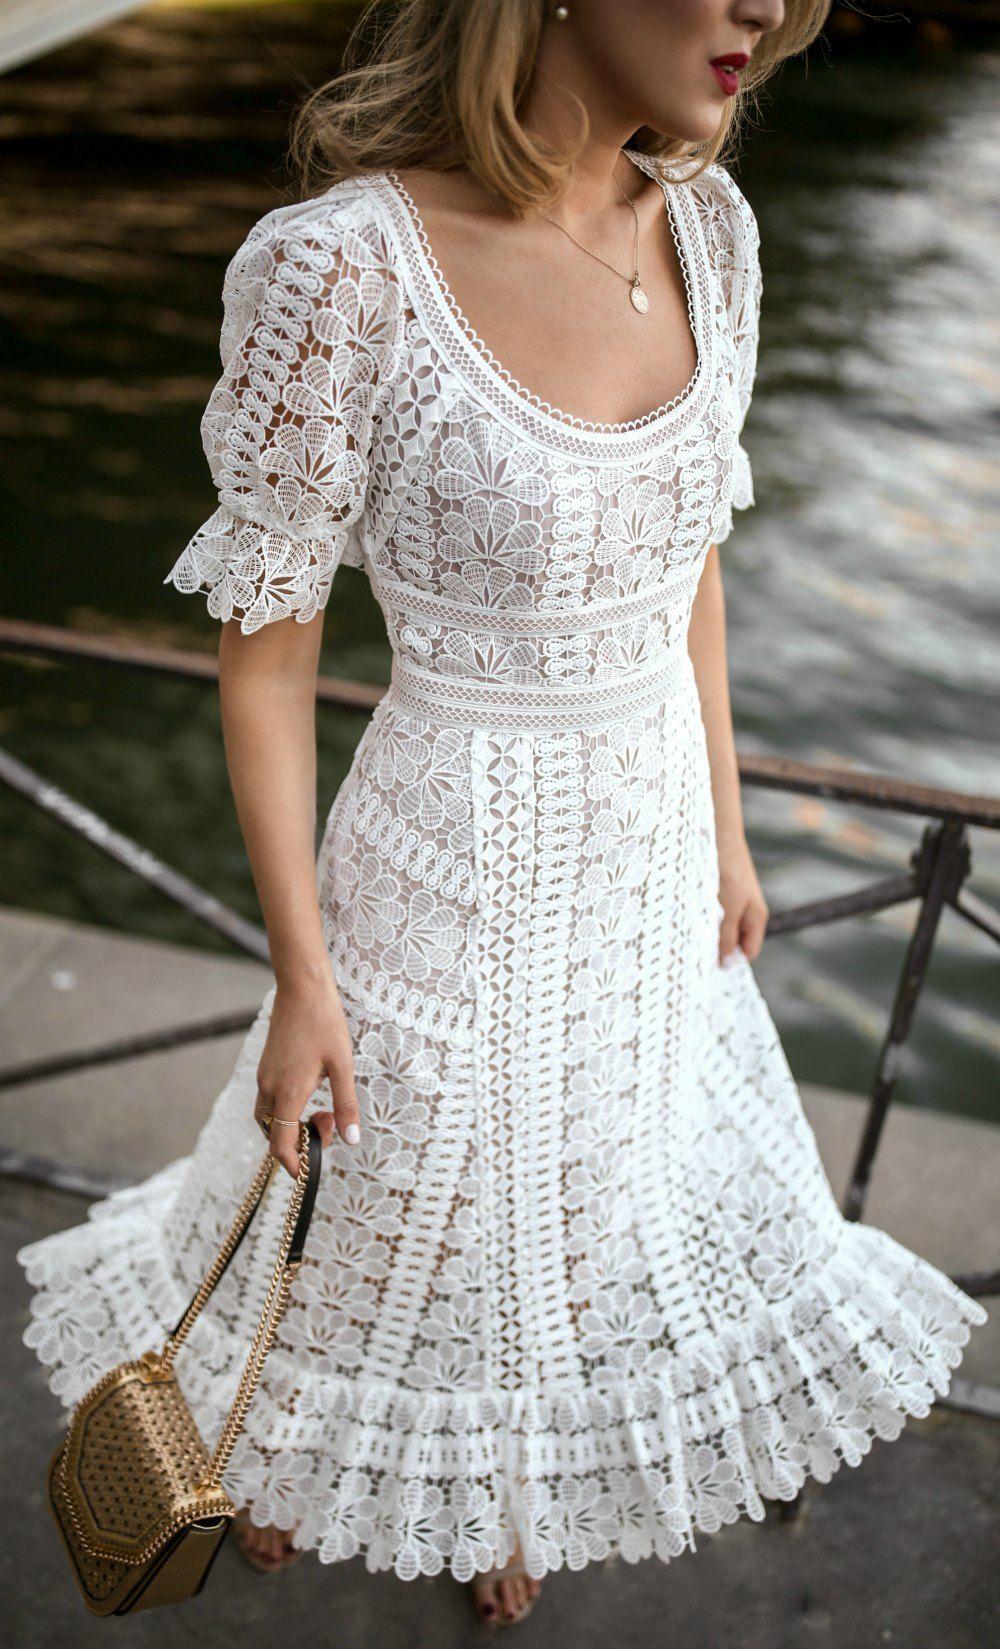 White Lace Dress Always Pretty Lace White Dress Lace Dress Dresses [ 1649 x 1000 Pixel ]